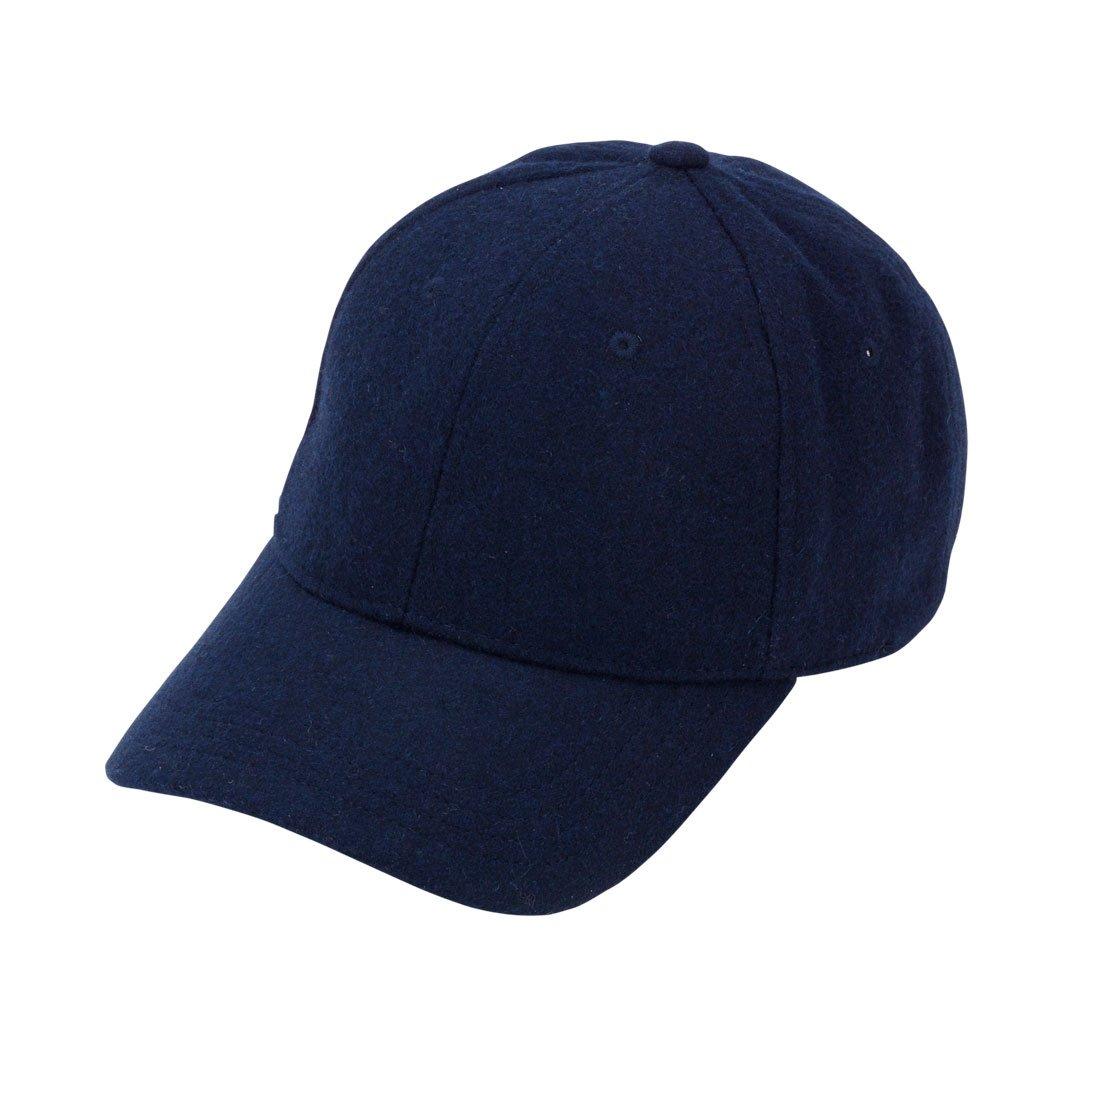 Wholesale Boutique Wool Blend Cap Navy ACLNY 812575025551